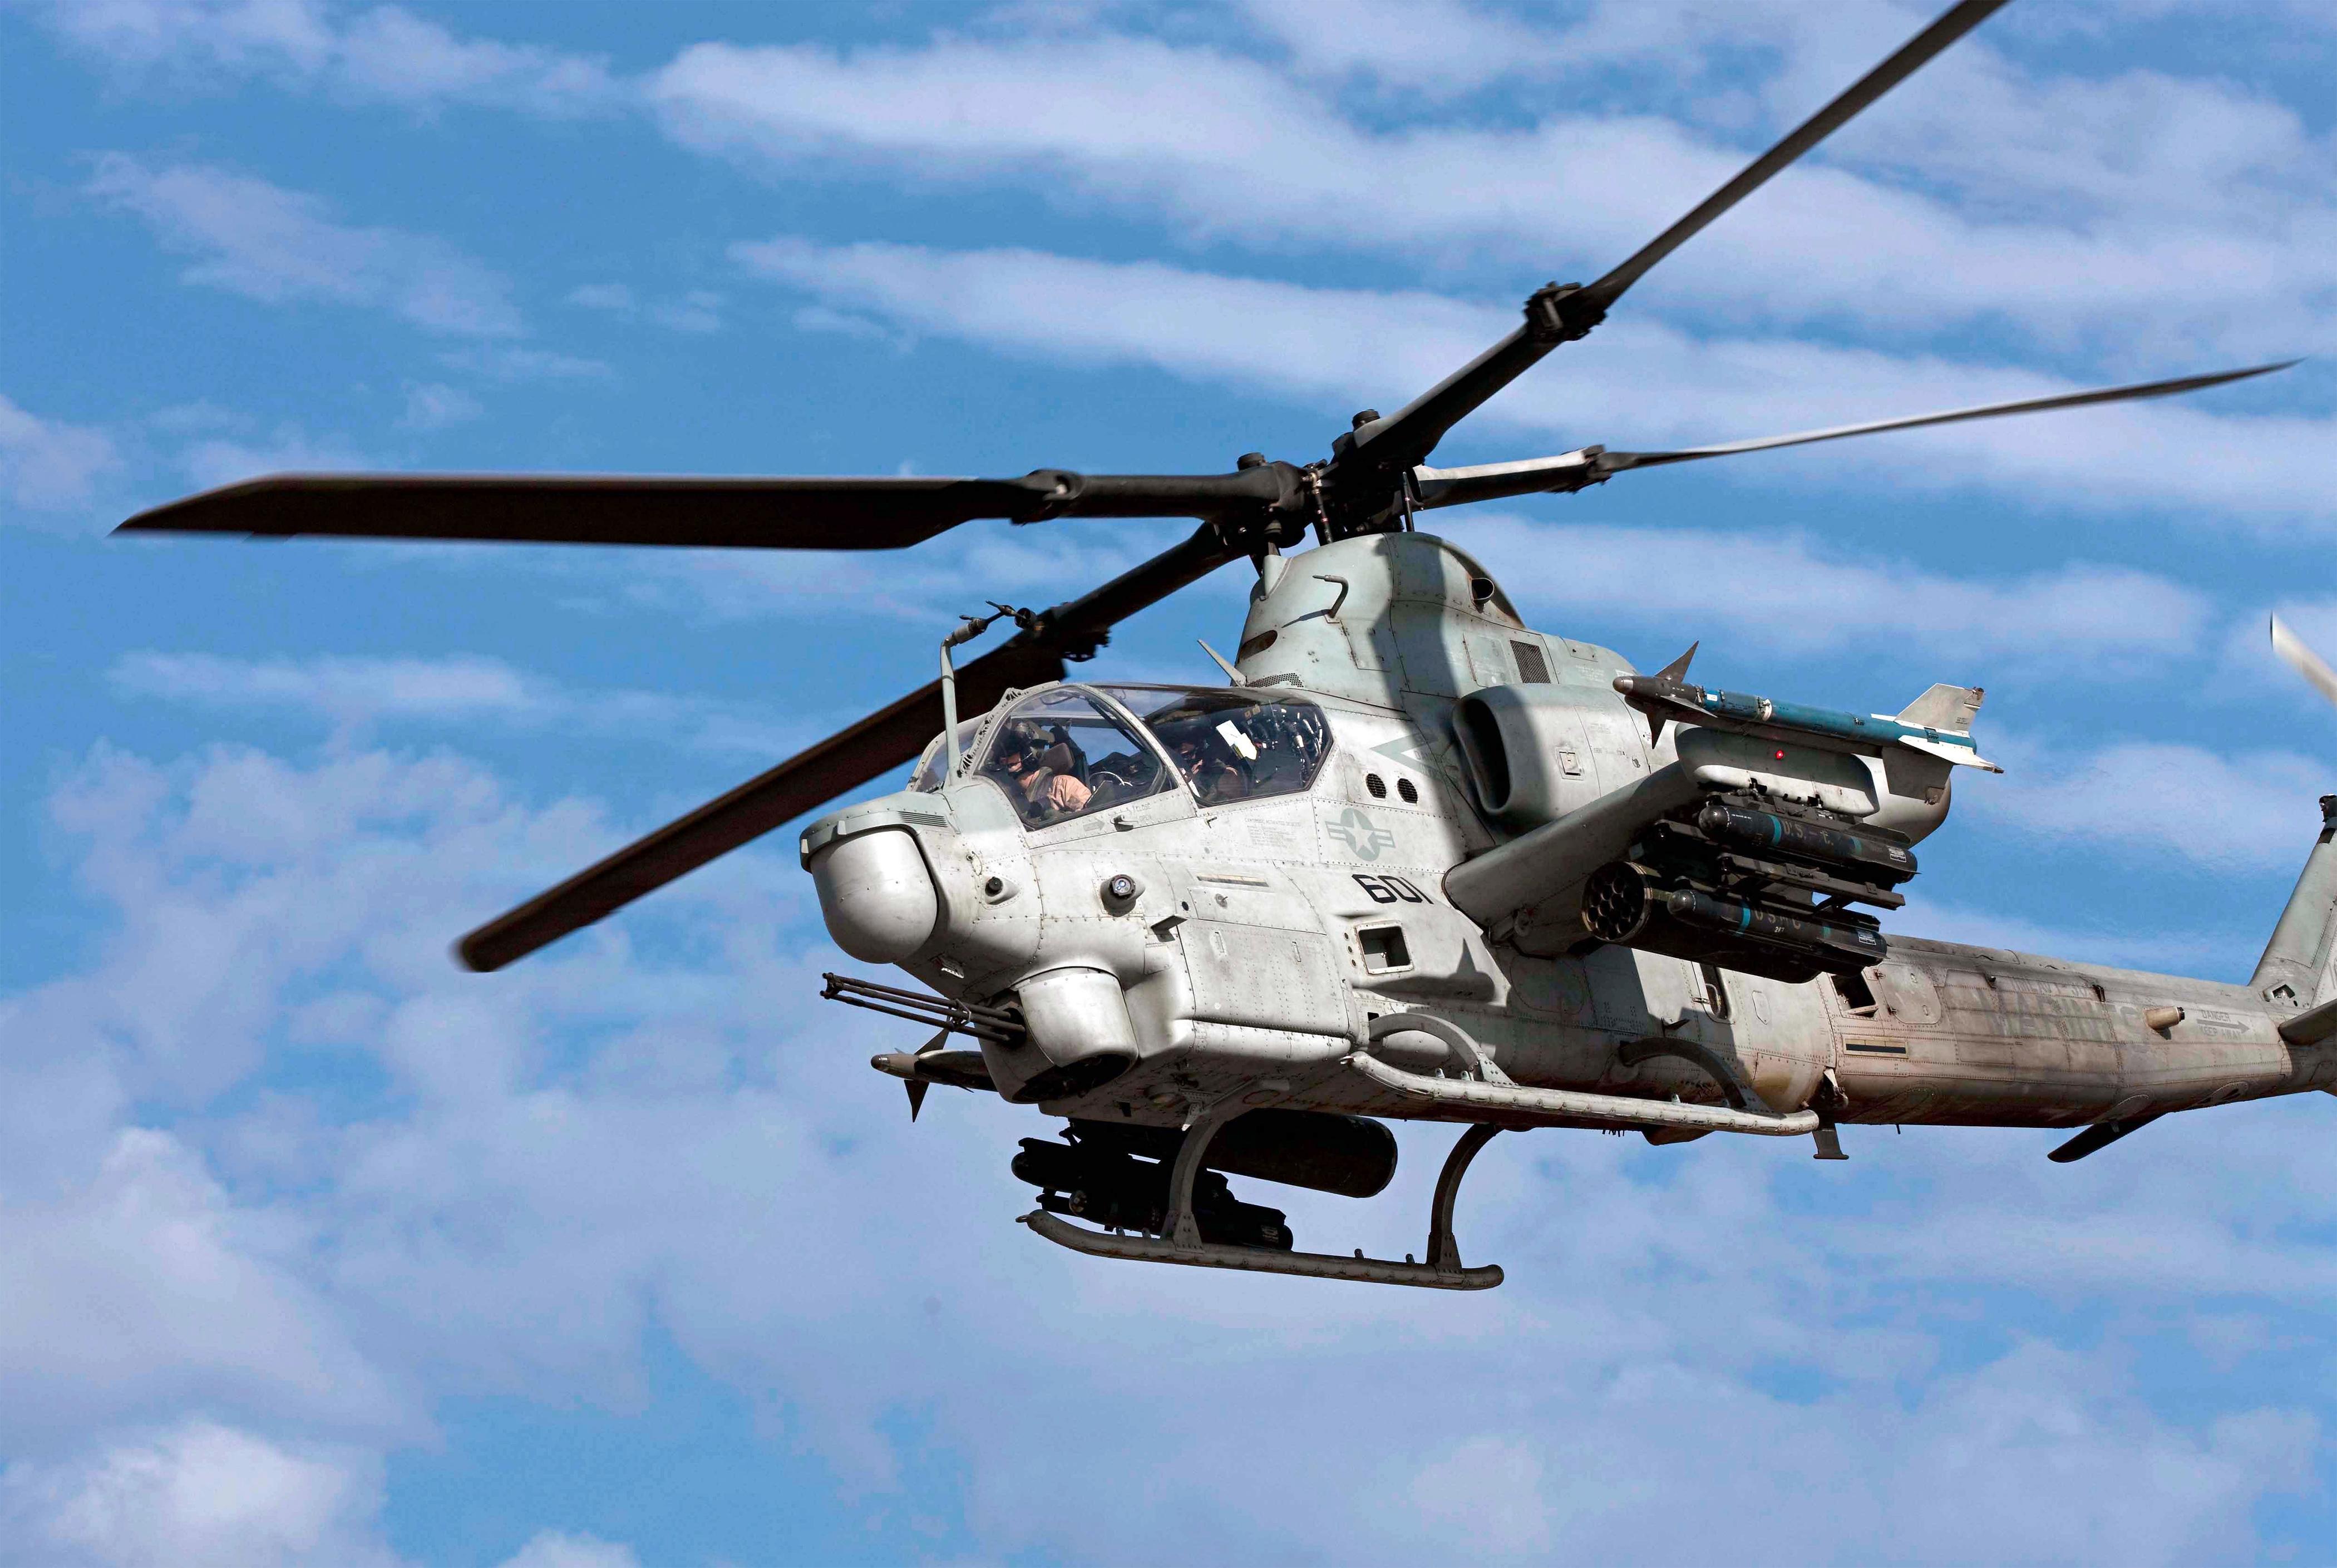 Bell ah 1z viper vertical flight photo gallery rjohnson publicscrutiny Images